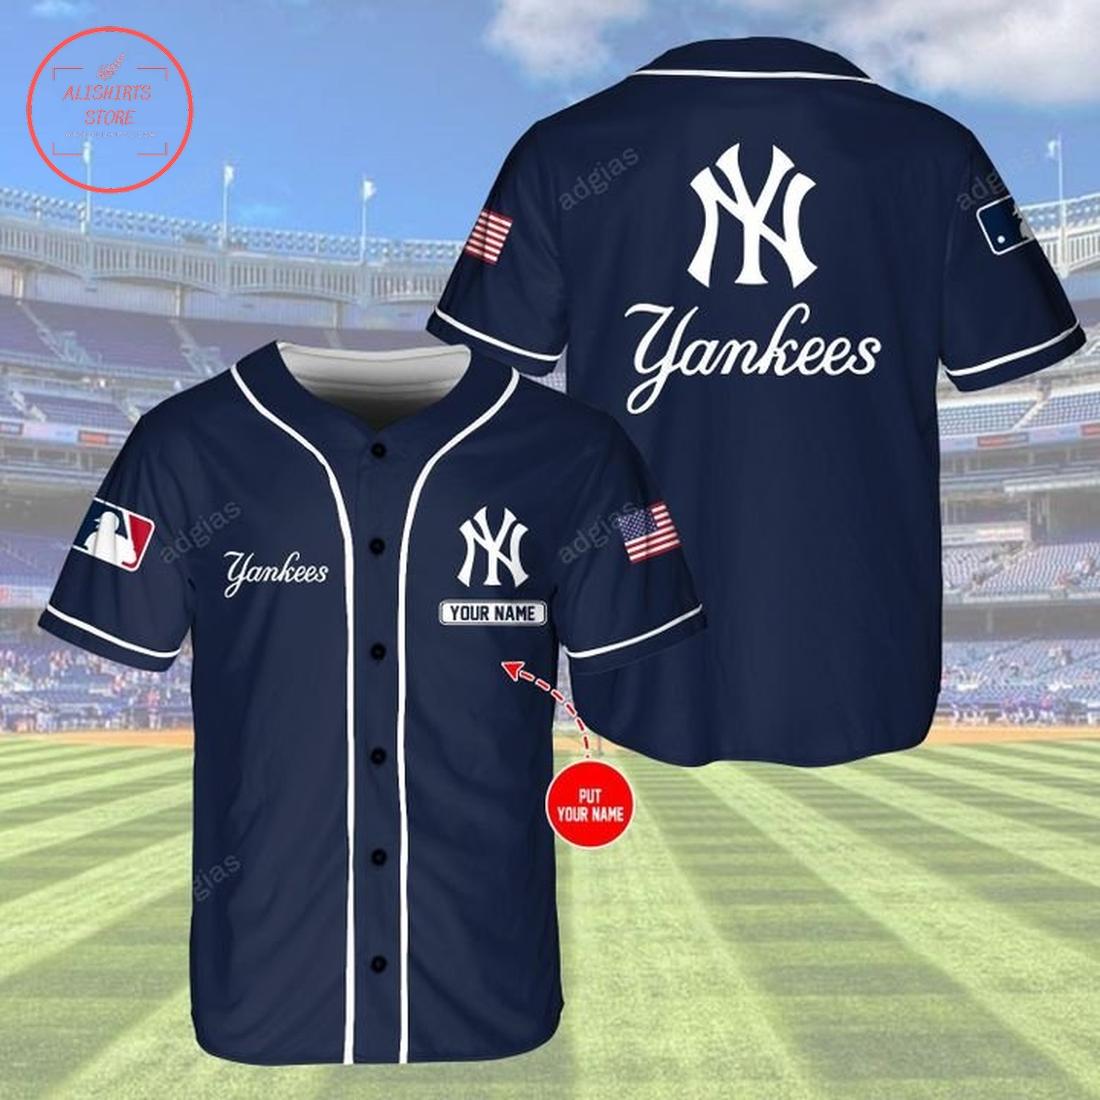 Personalize New York Yankees Navy Baseball Jersey